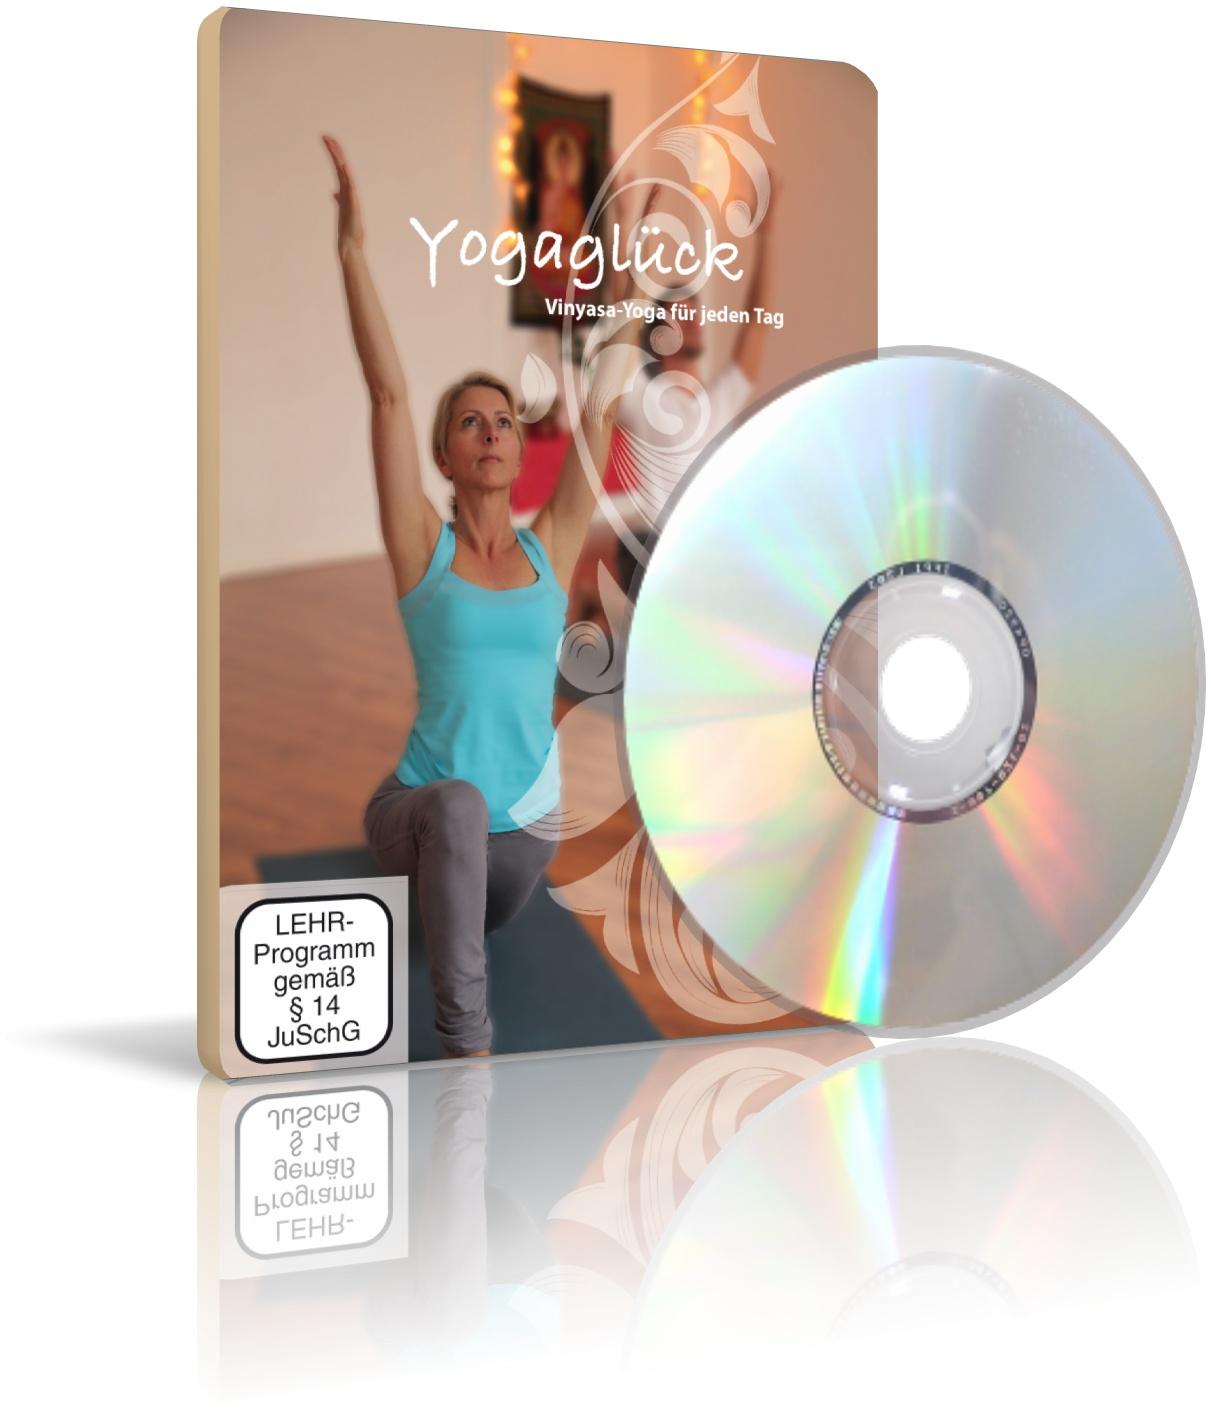 Yogaglück von Simone Behlendorf (DVD)